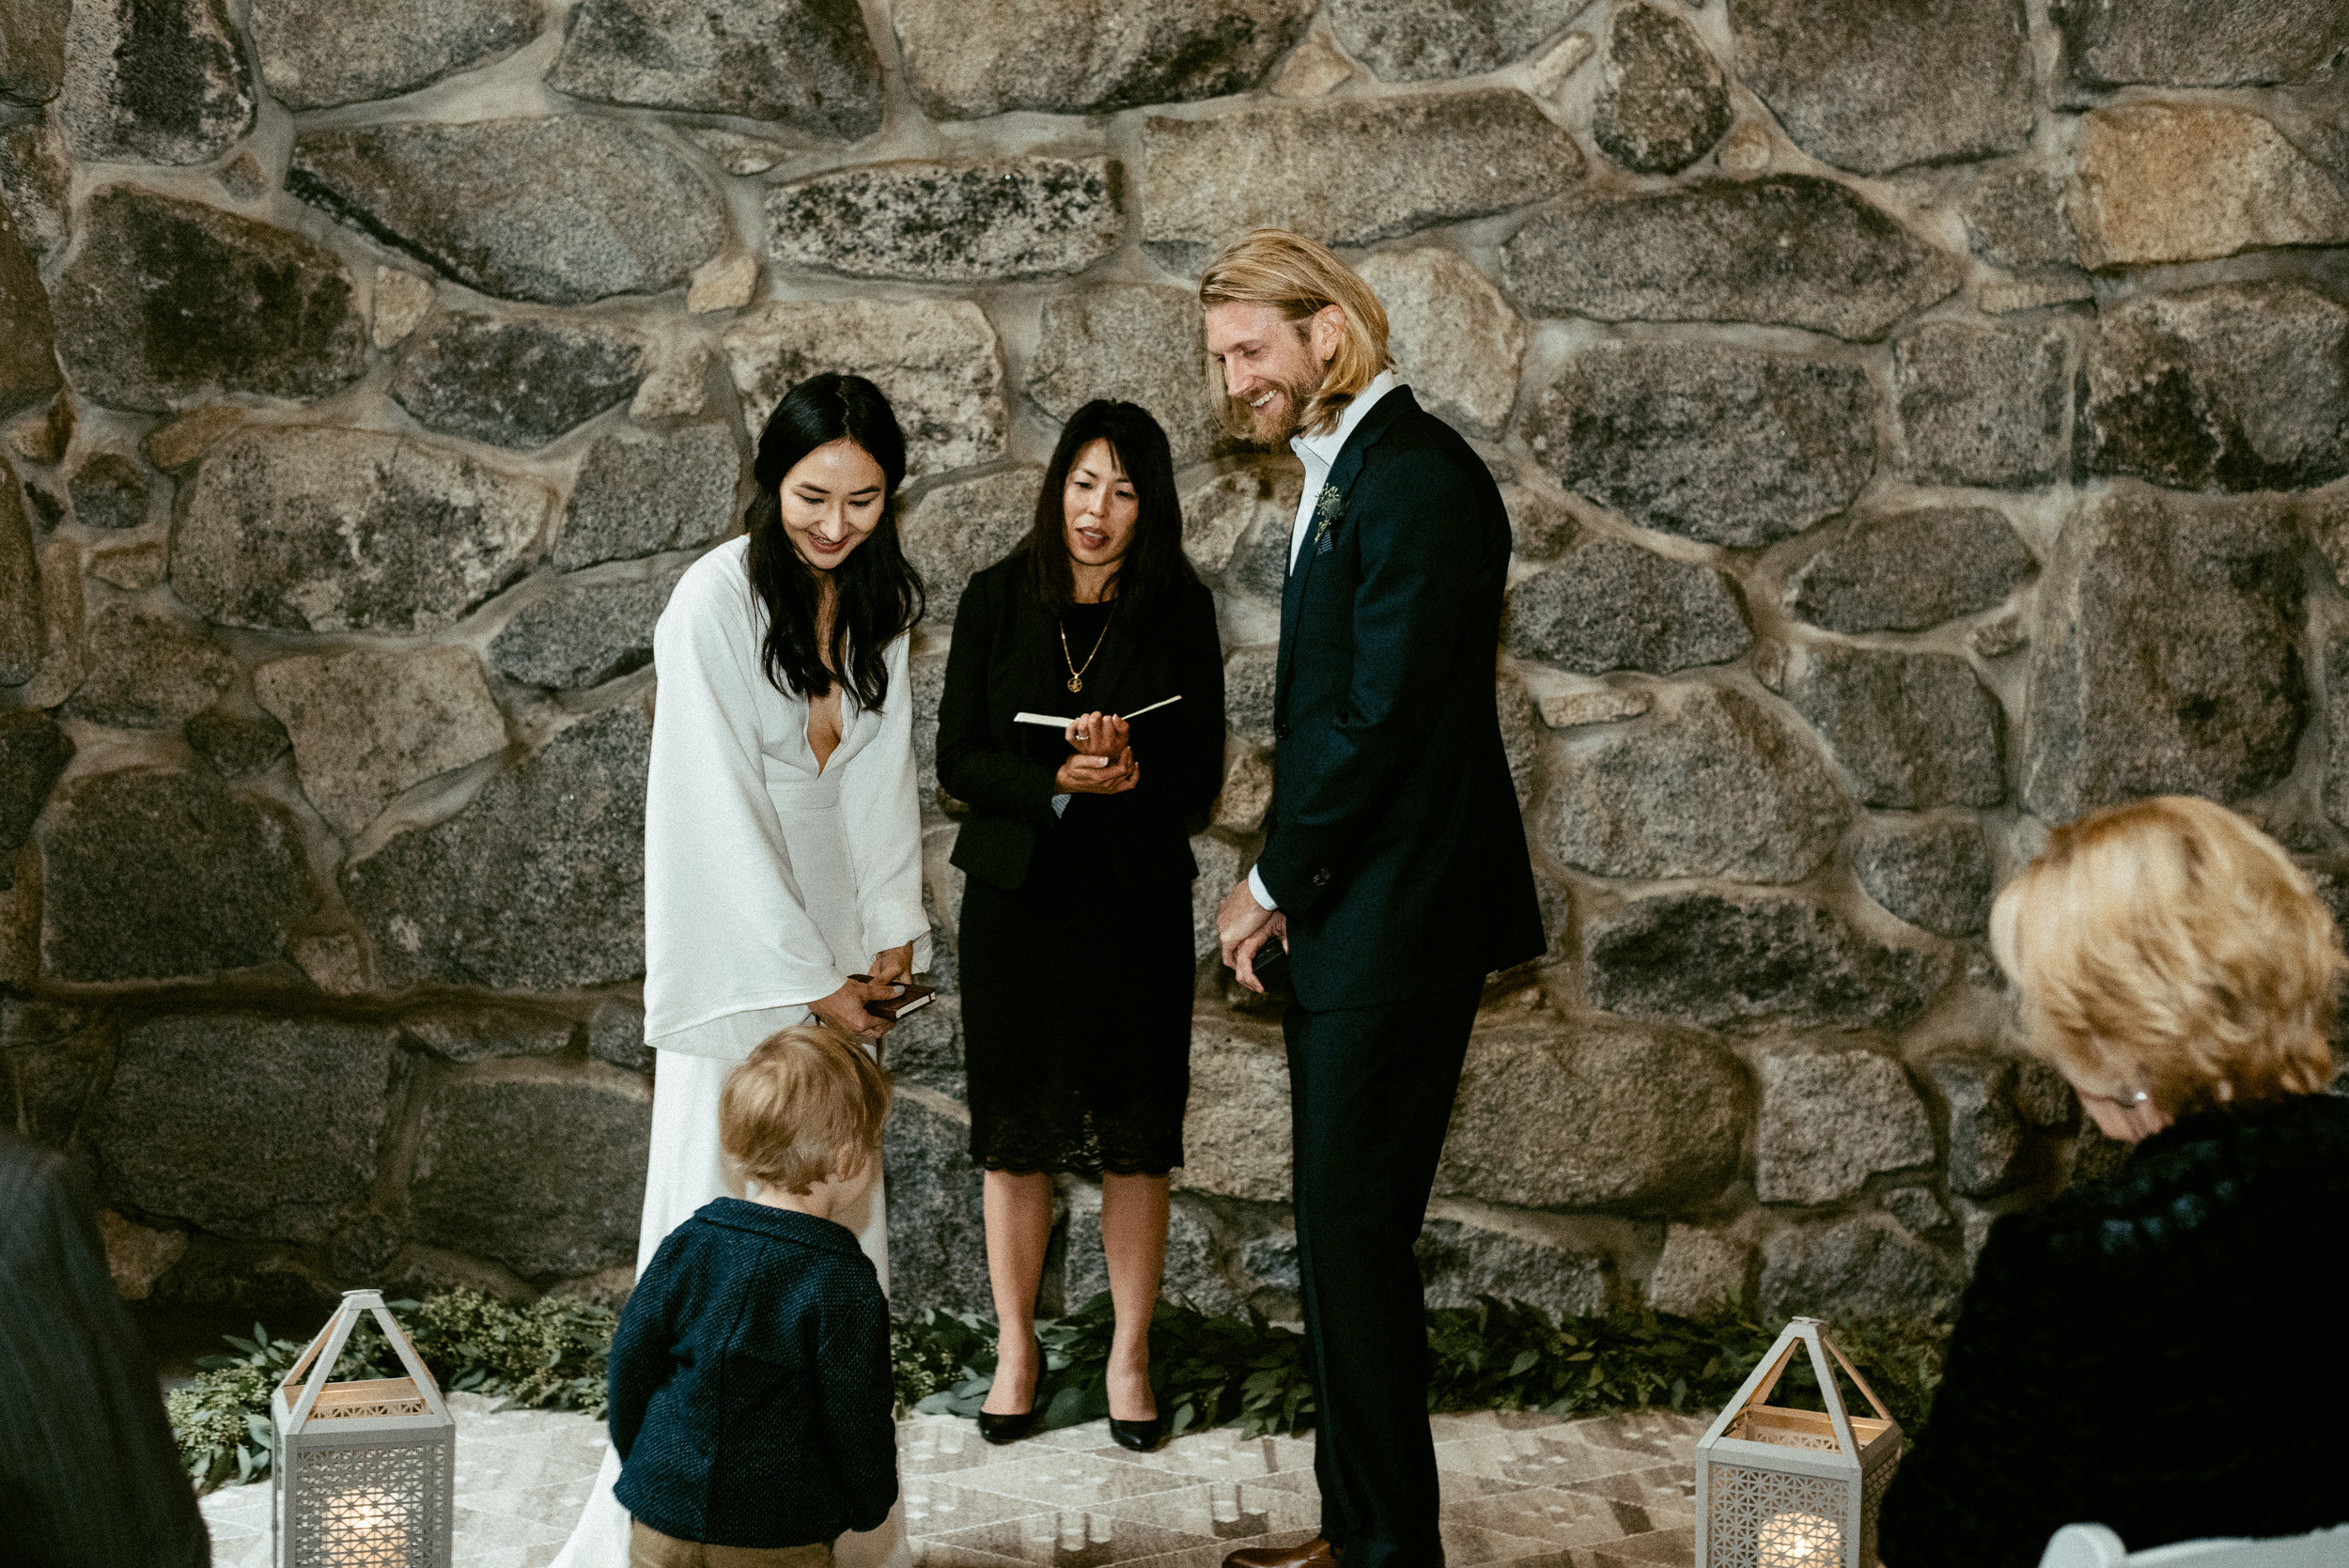 yosemite-wedding-dana-sean-52.jpg